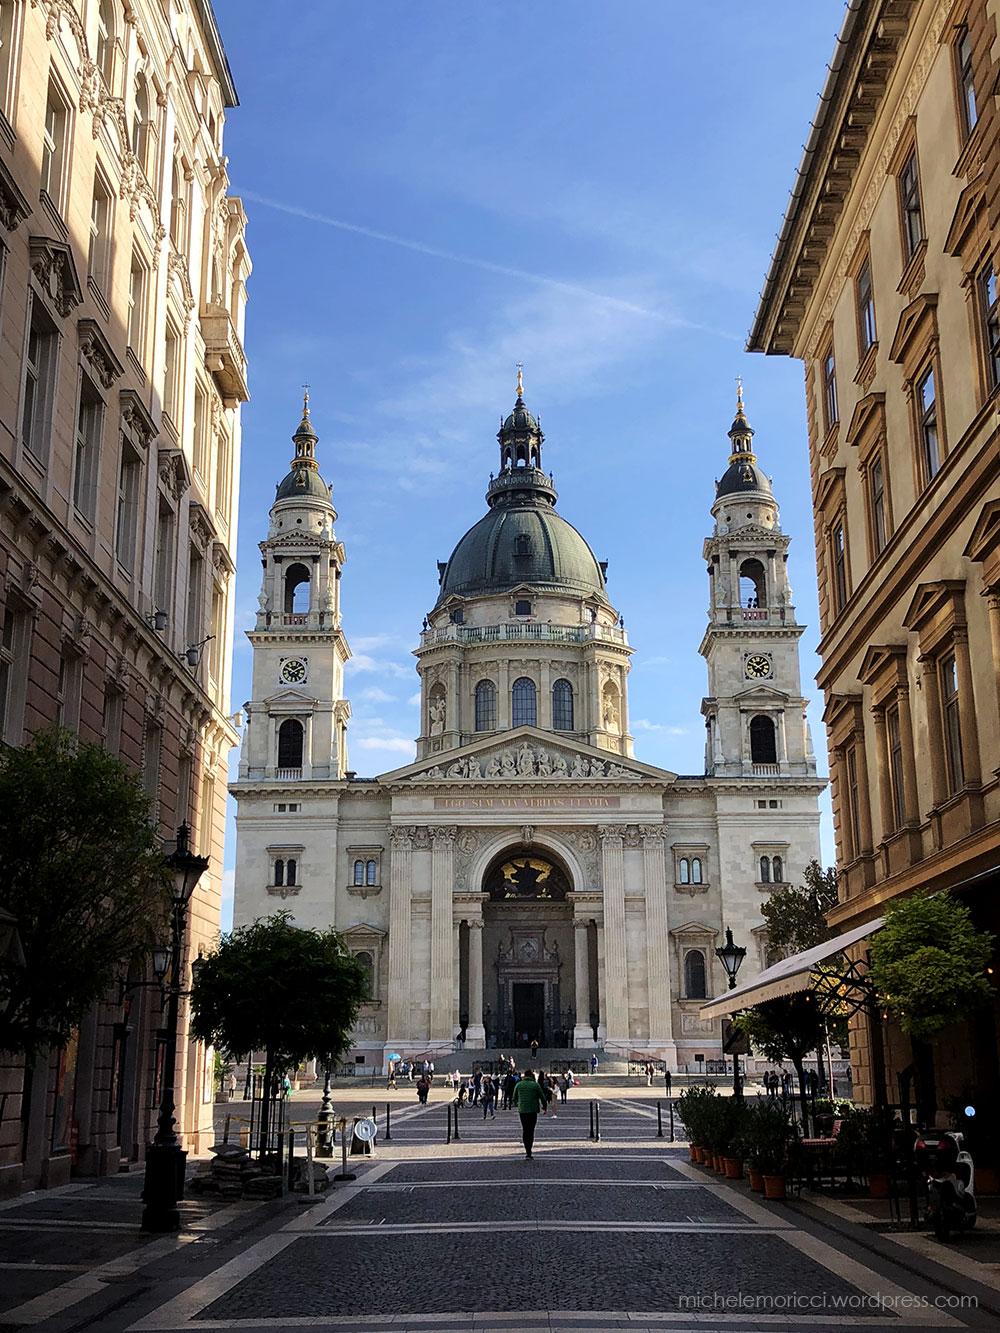 MicheleMoricci-Budapest-2018-19